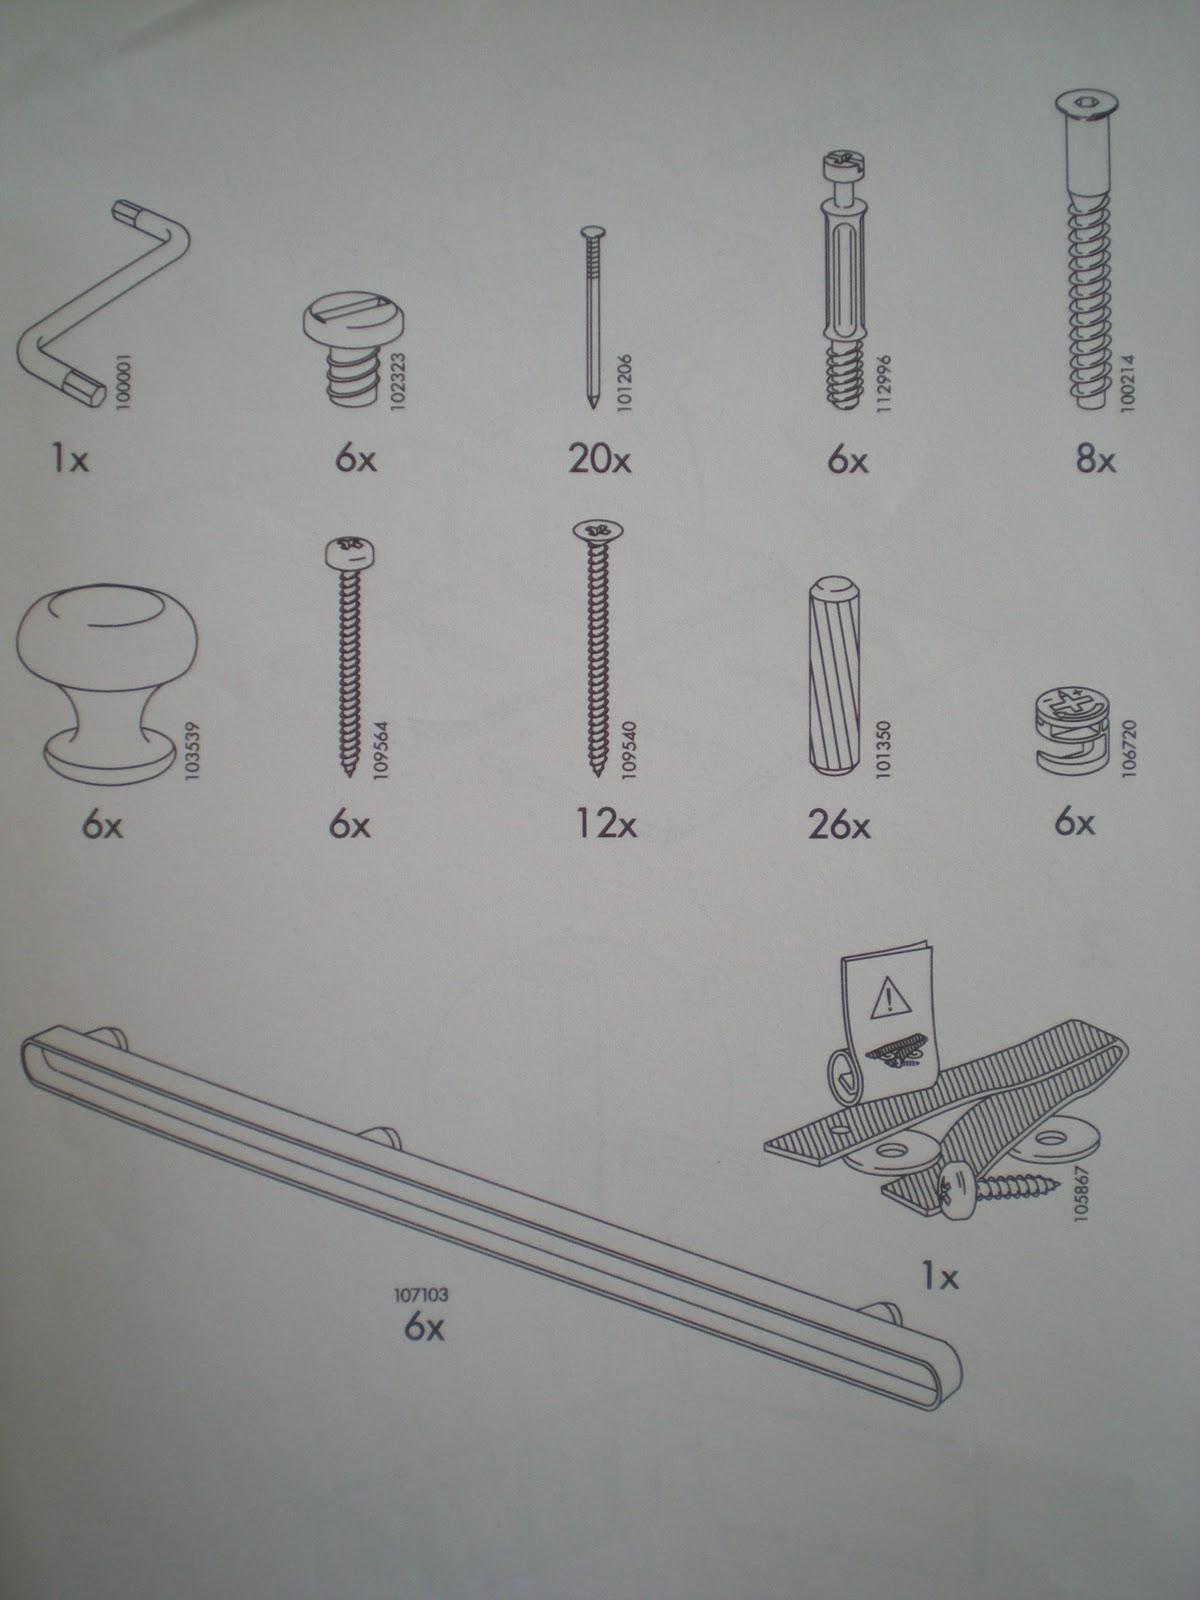 El blog de canca montaje de cajonera ikea for Instrucciones muebles ikea